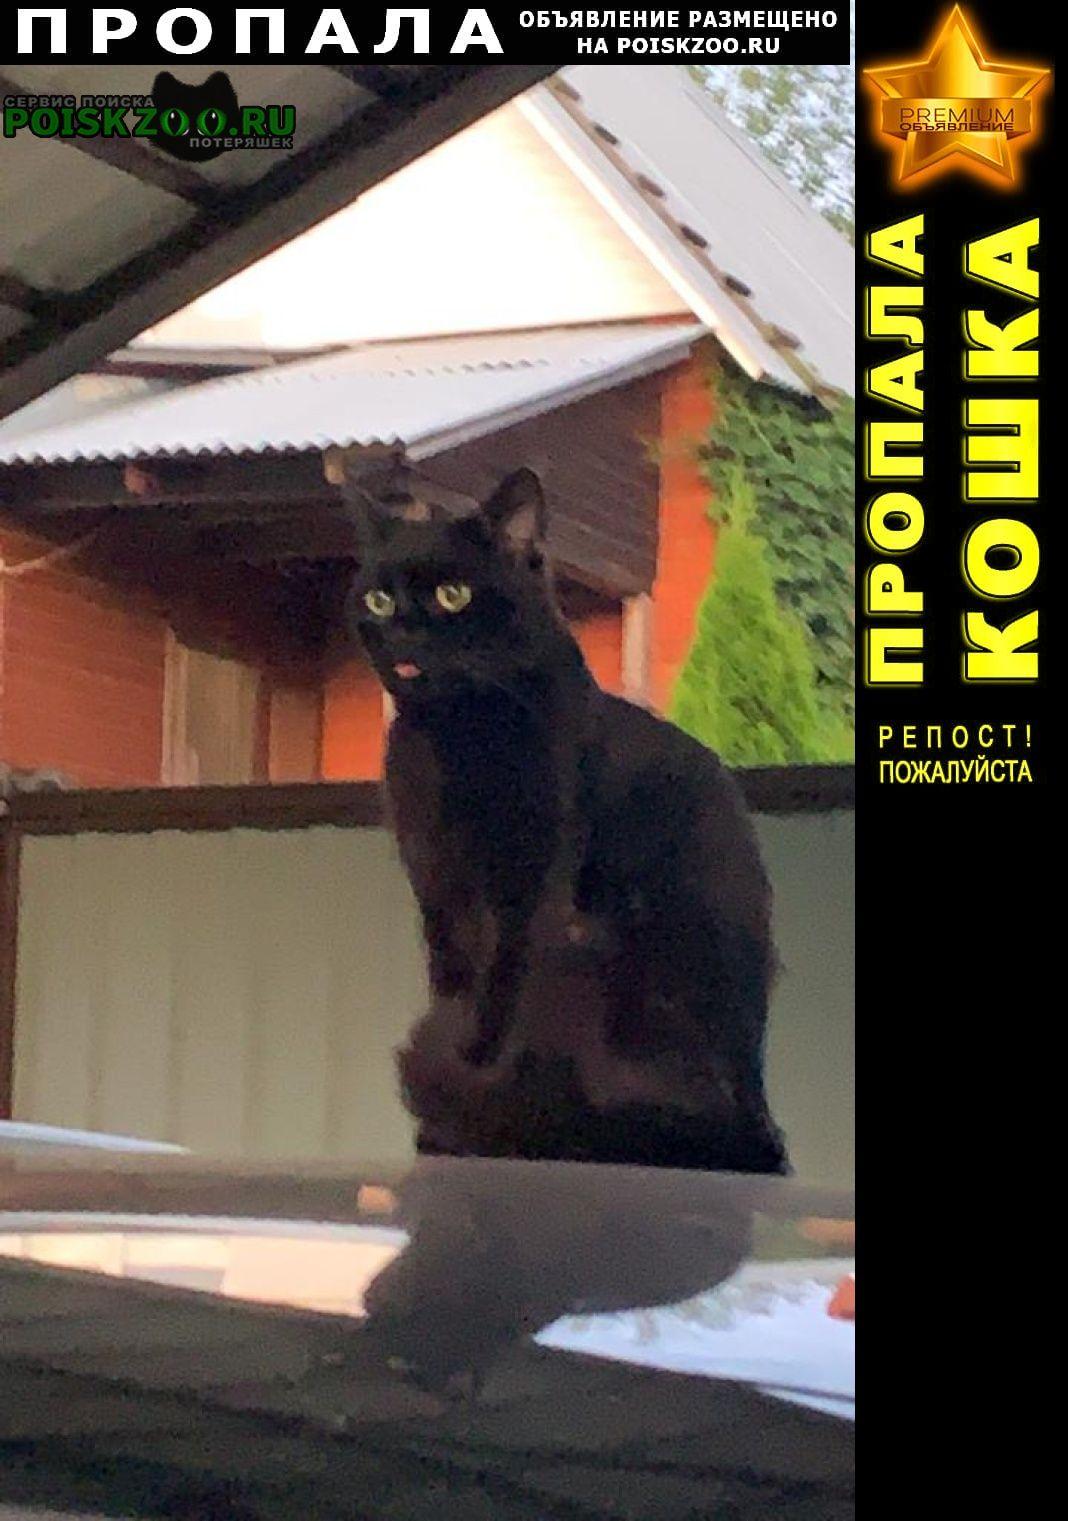 Пропал кот чёрный Апрелевка